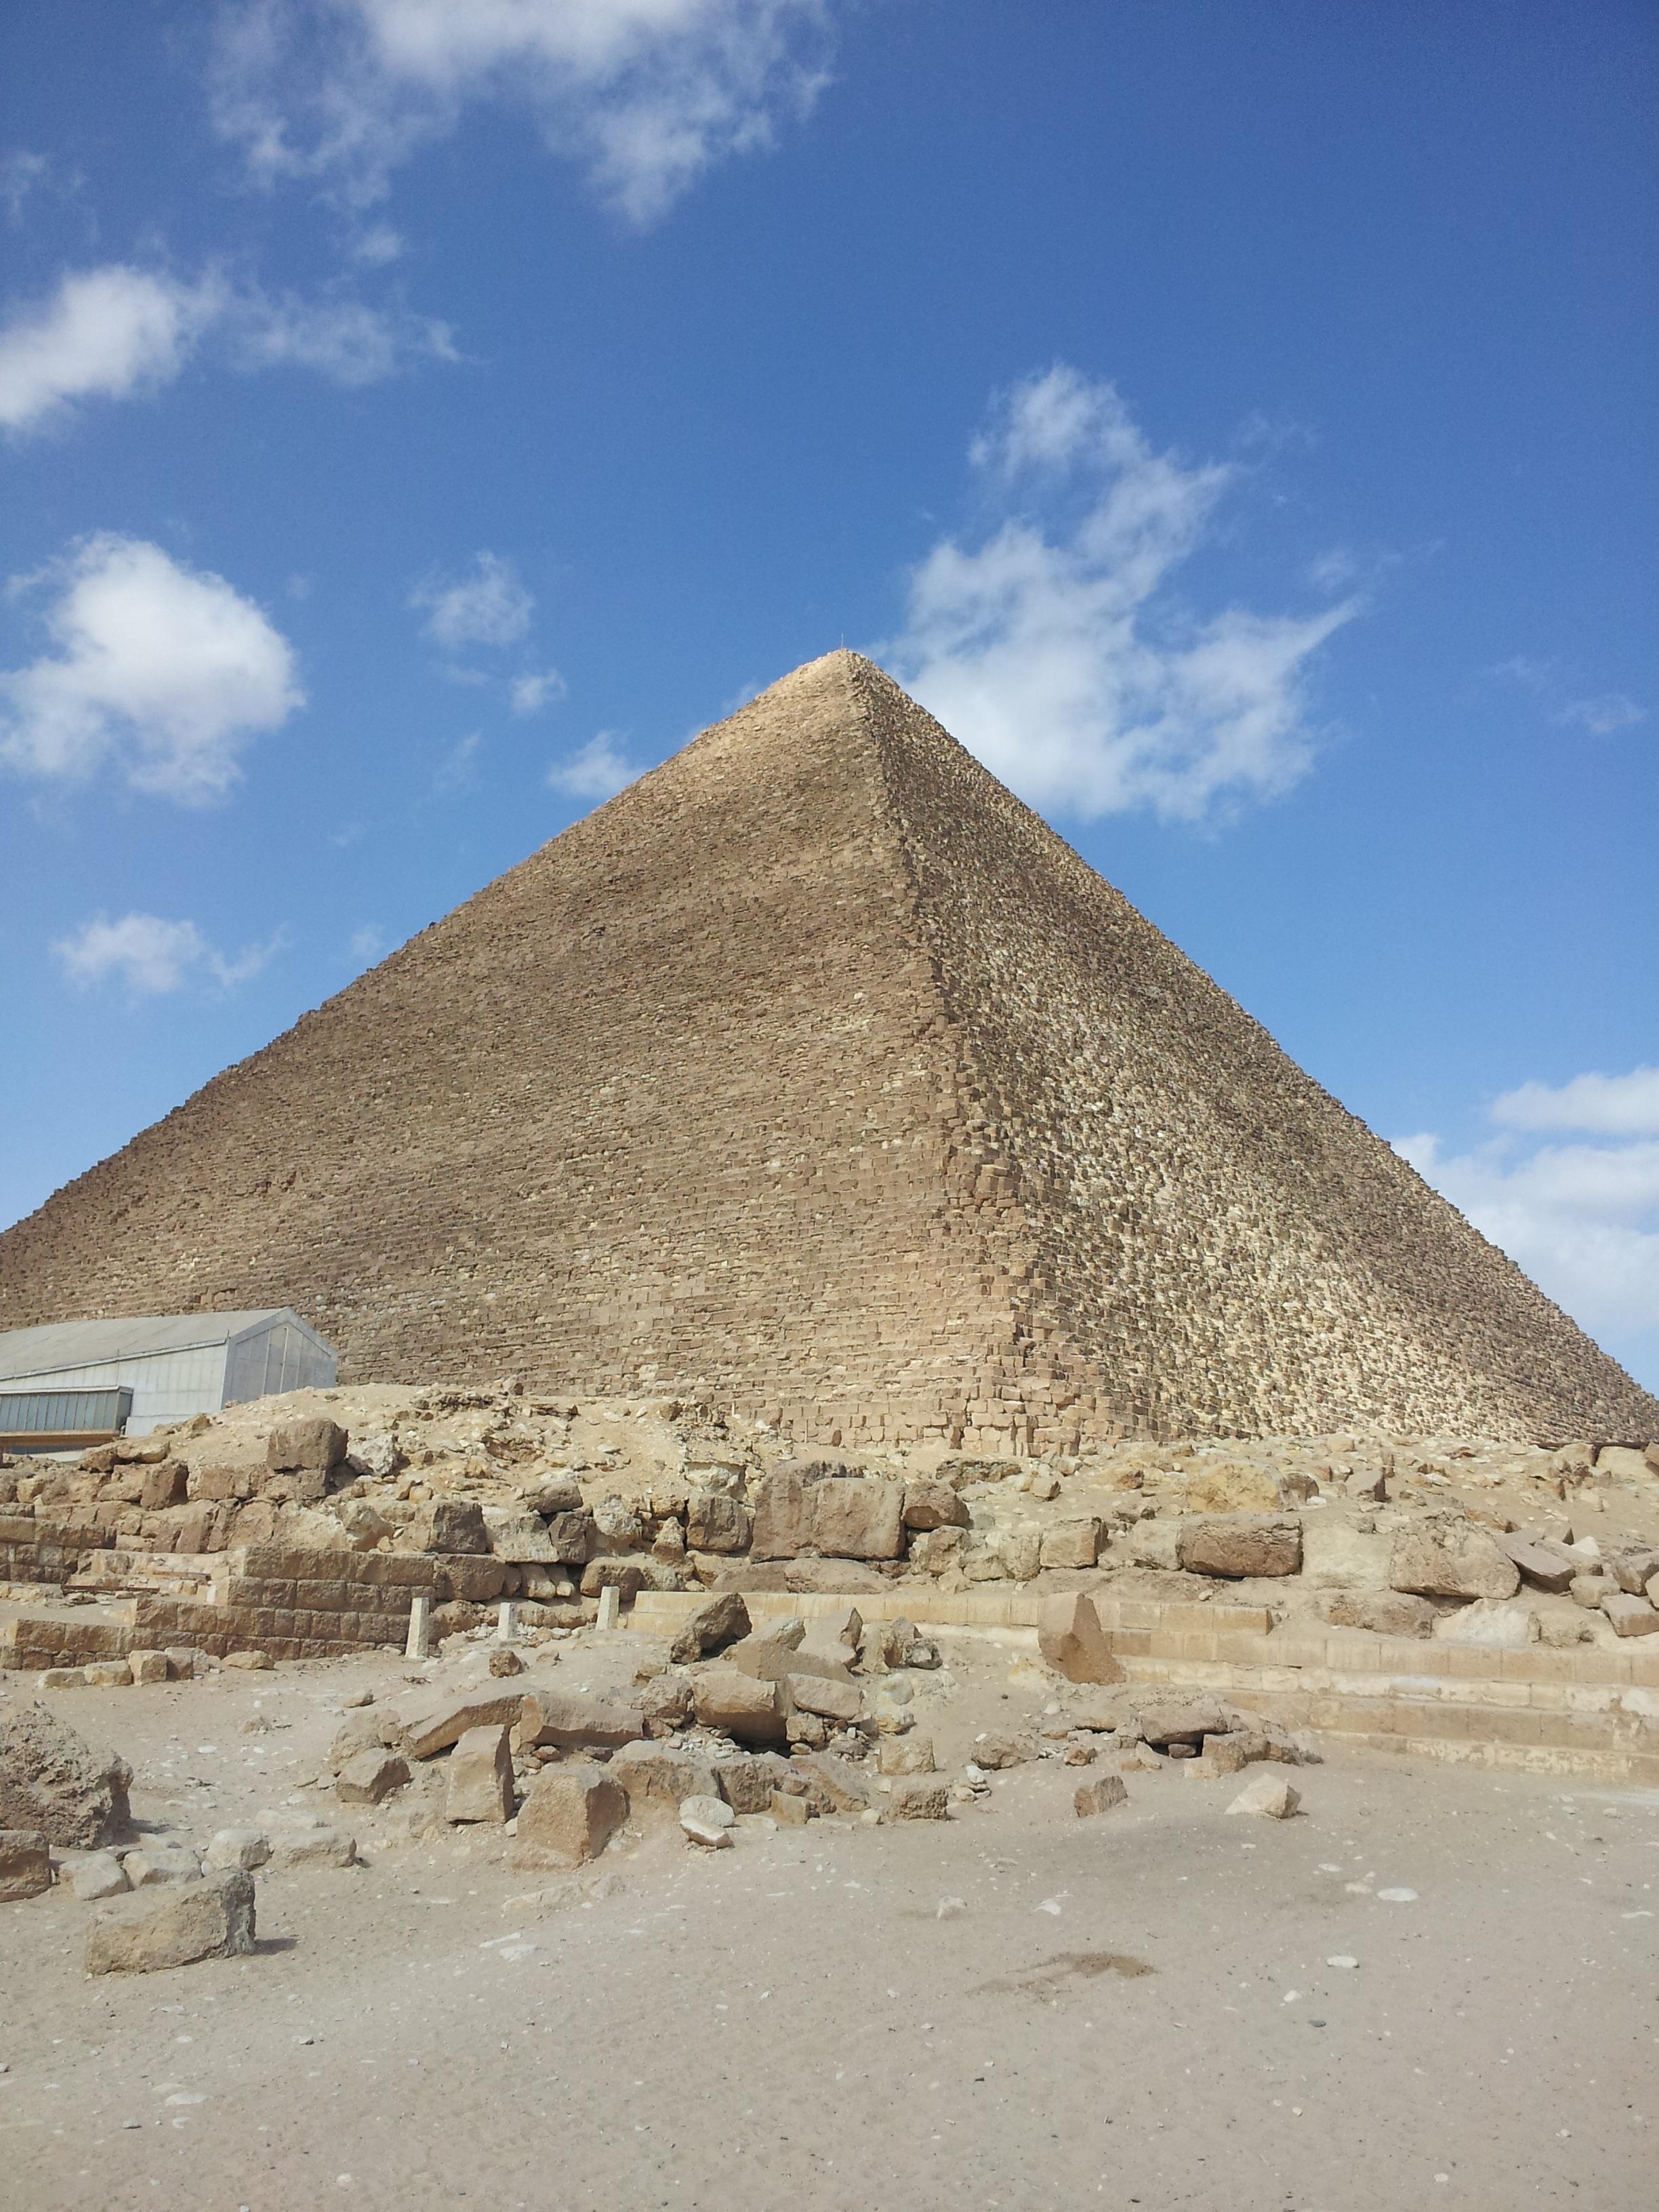 Gambar Gurun Batu Monumen Piramida Mesir Tanah Tandus Giza